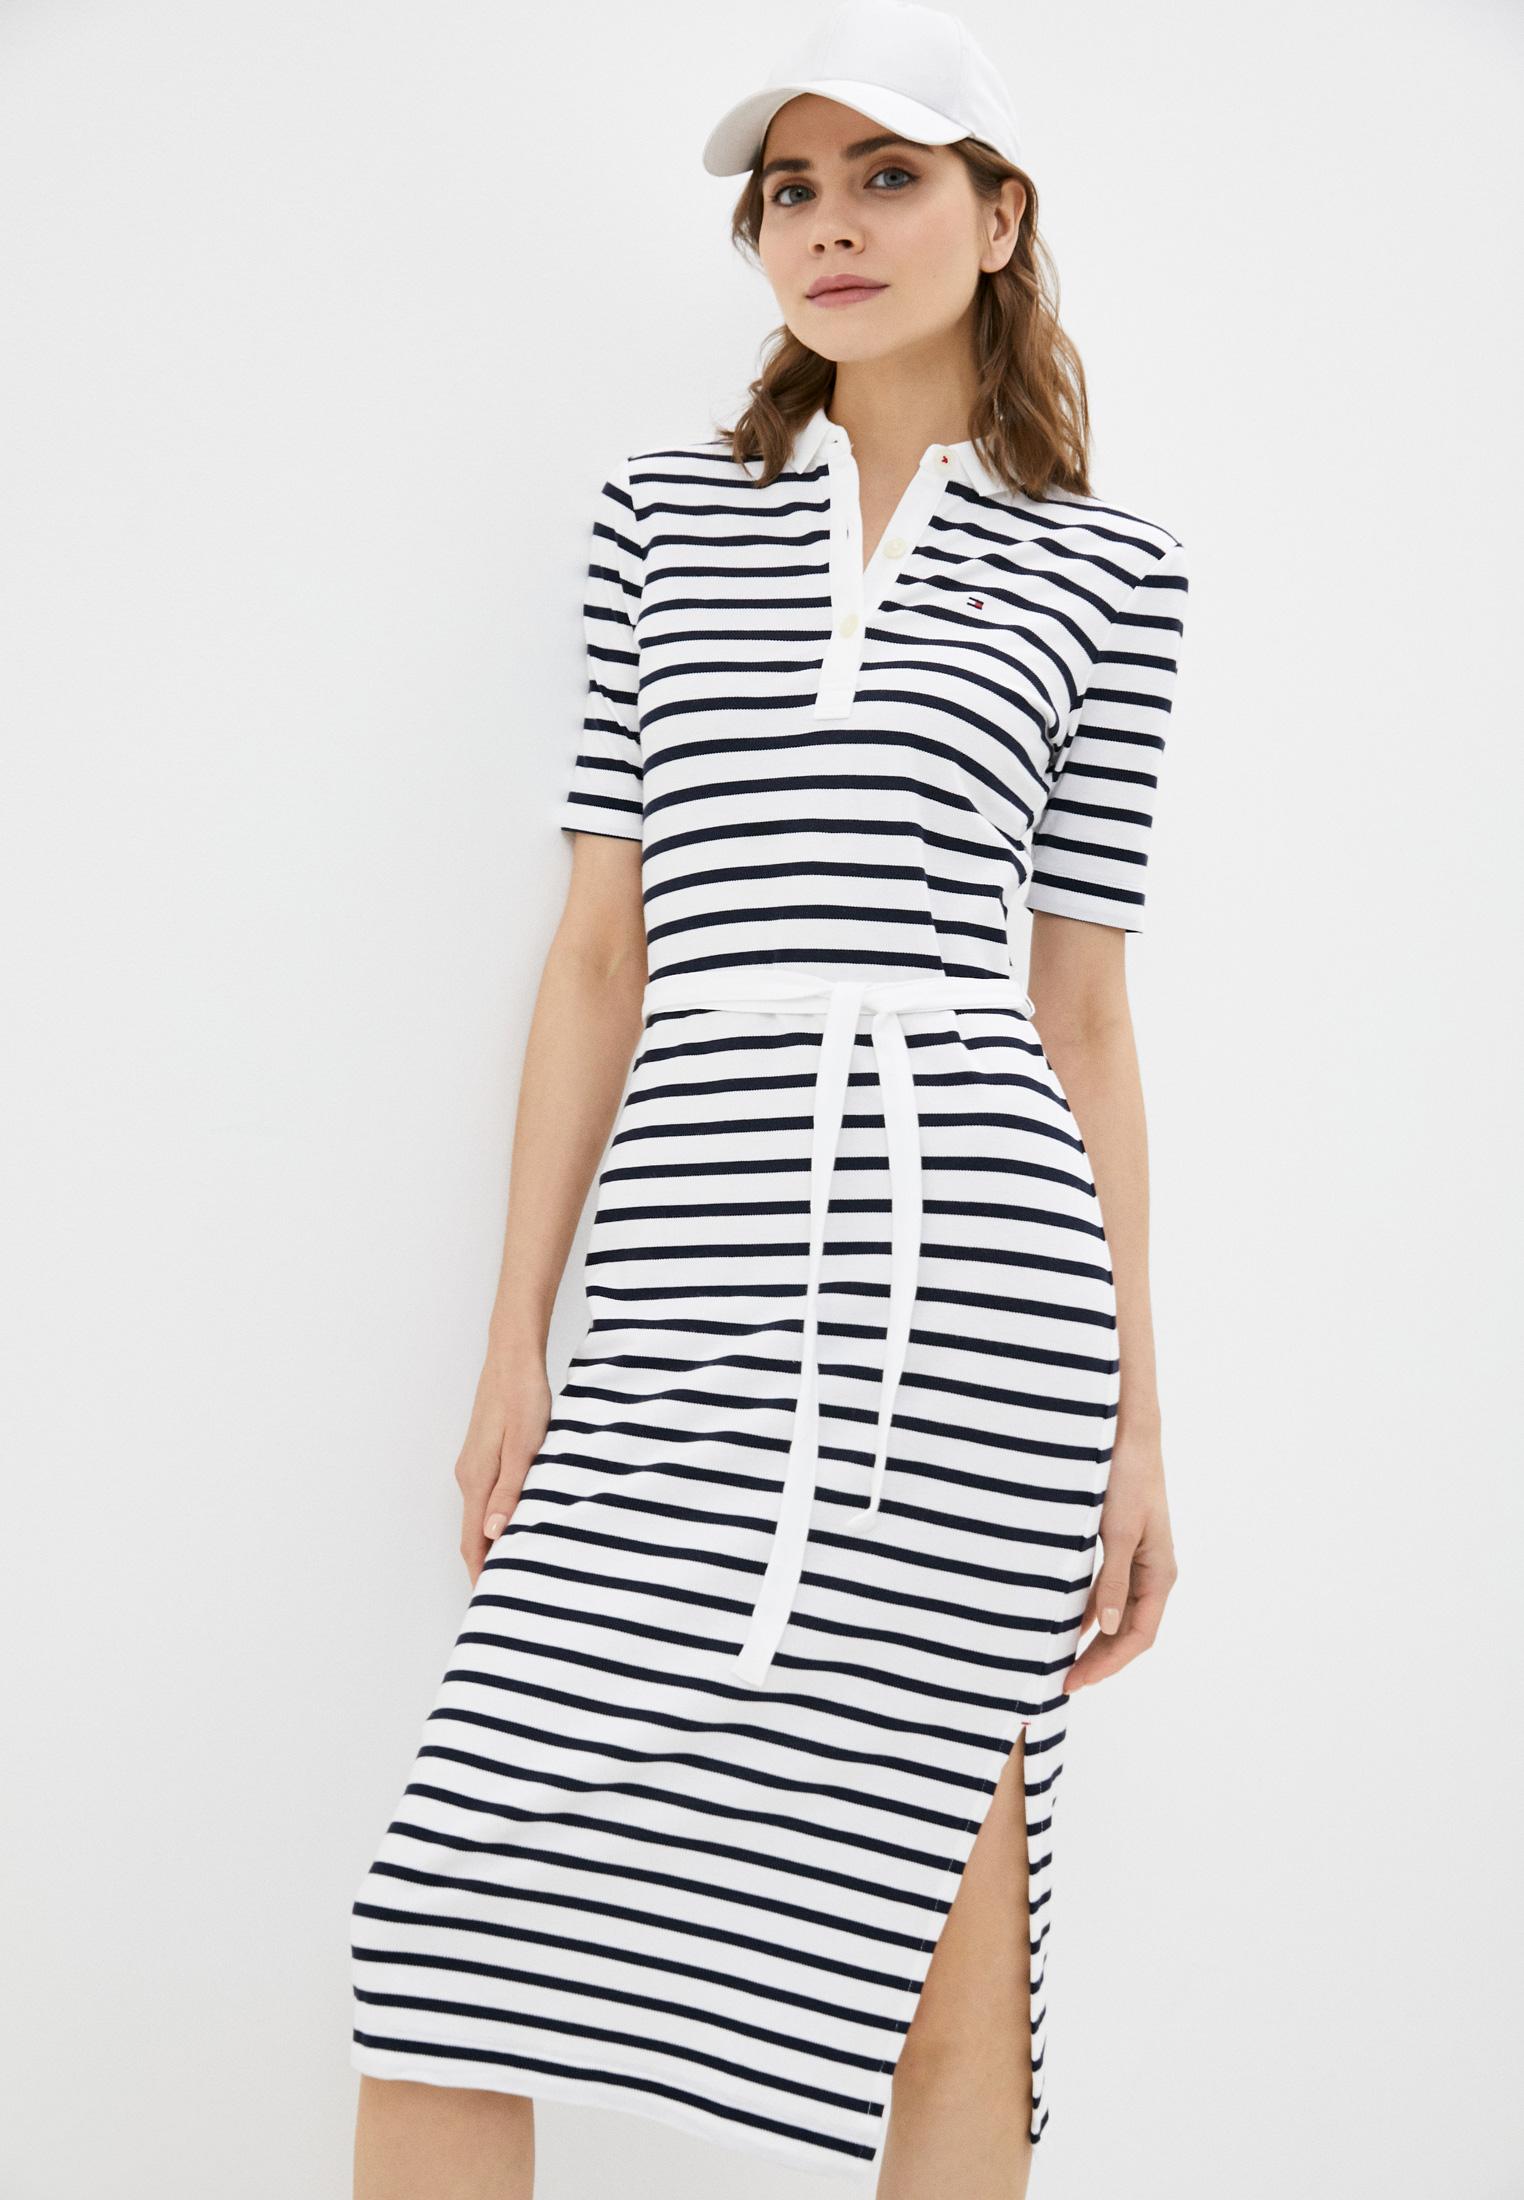 Платье Tommy Hilfiger (Томми Хилфигер) WW0WW30370: изображение 1